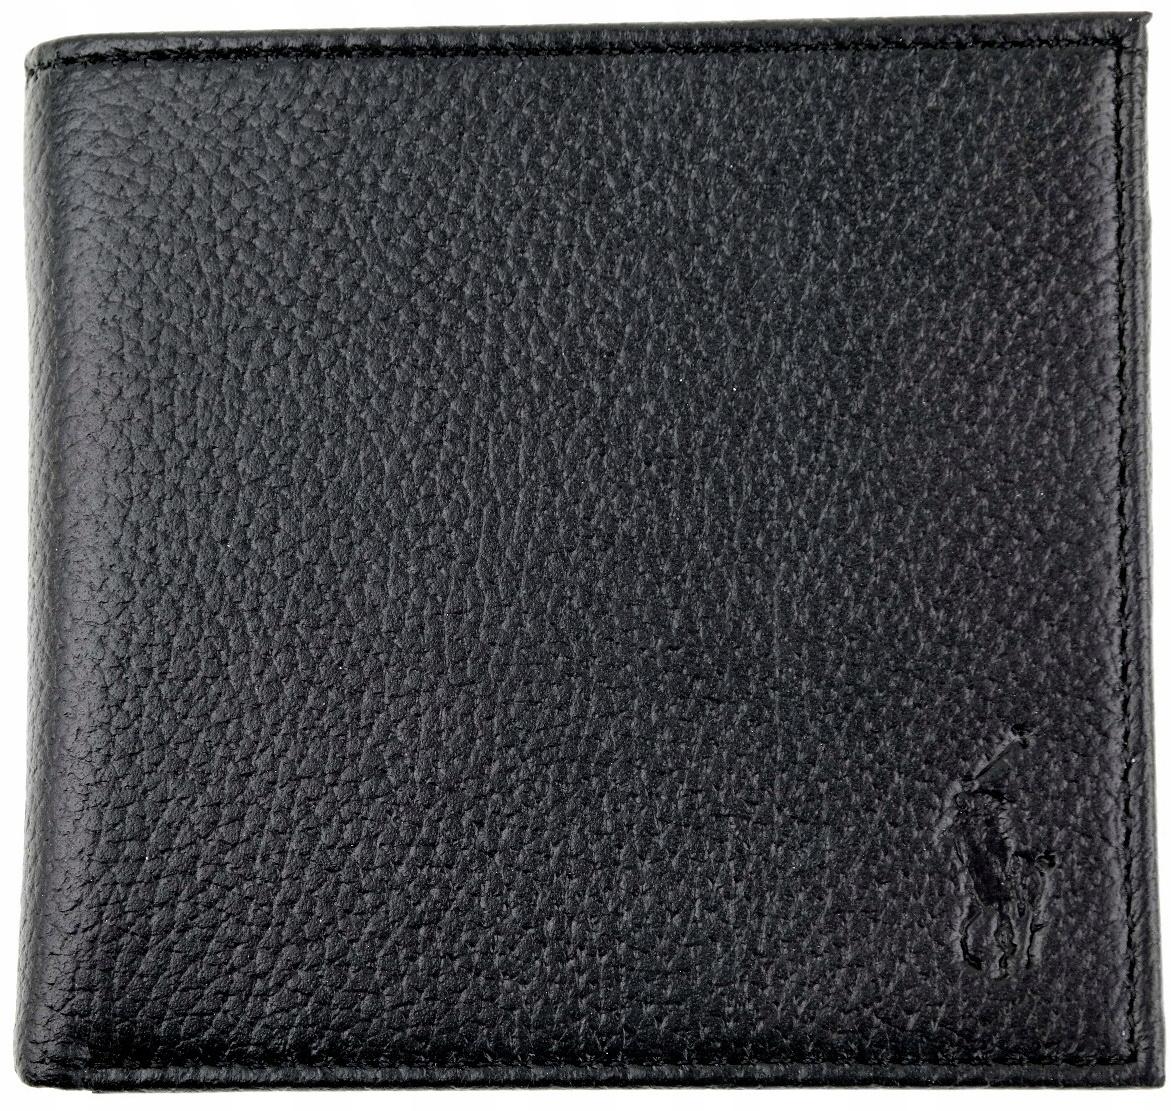 c9b6e18e6aec7 POLO RALPH LAUREN portfel męski skóra czarny - 7515821270 ...